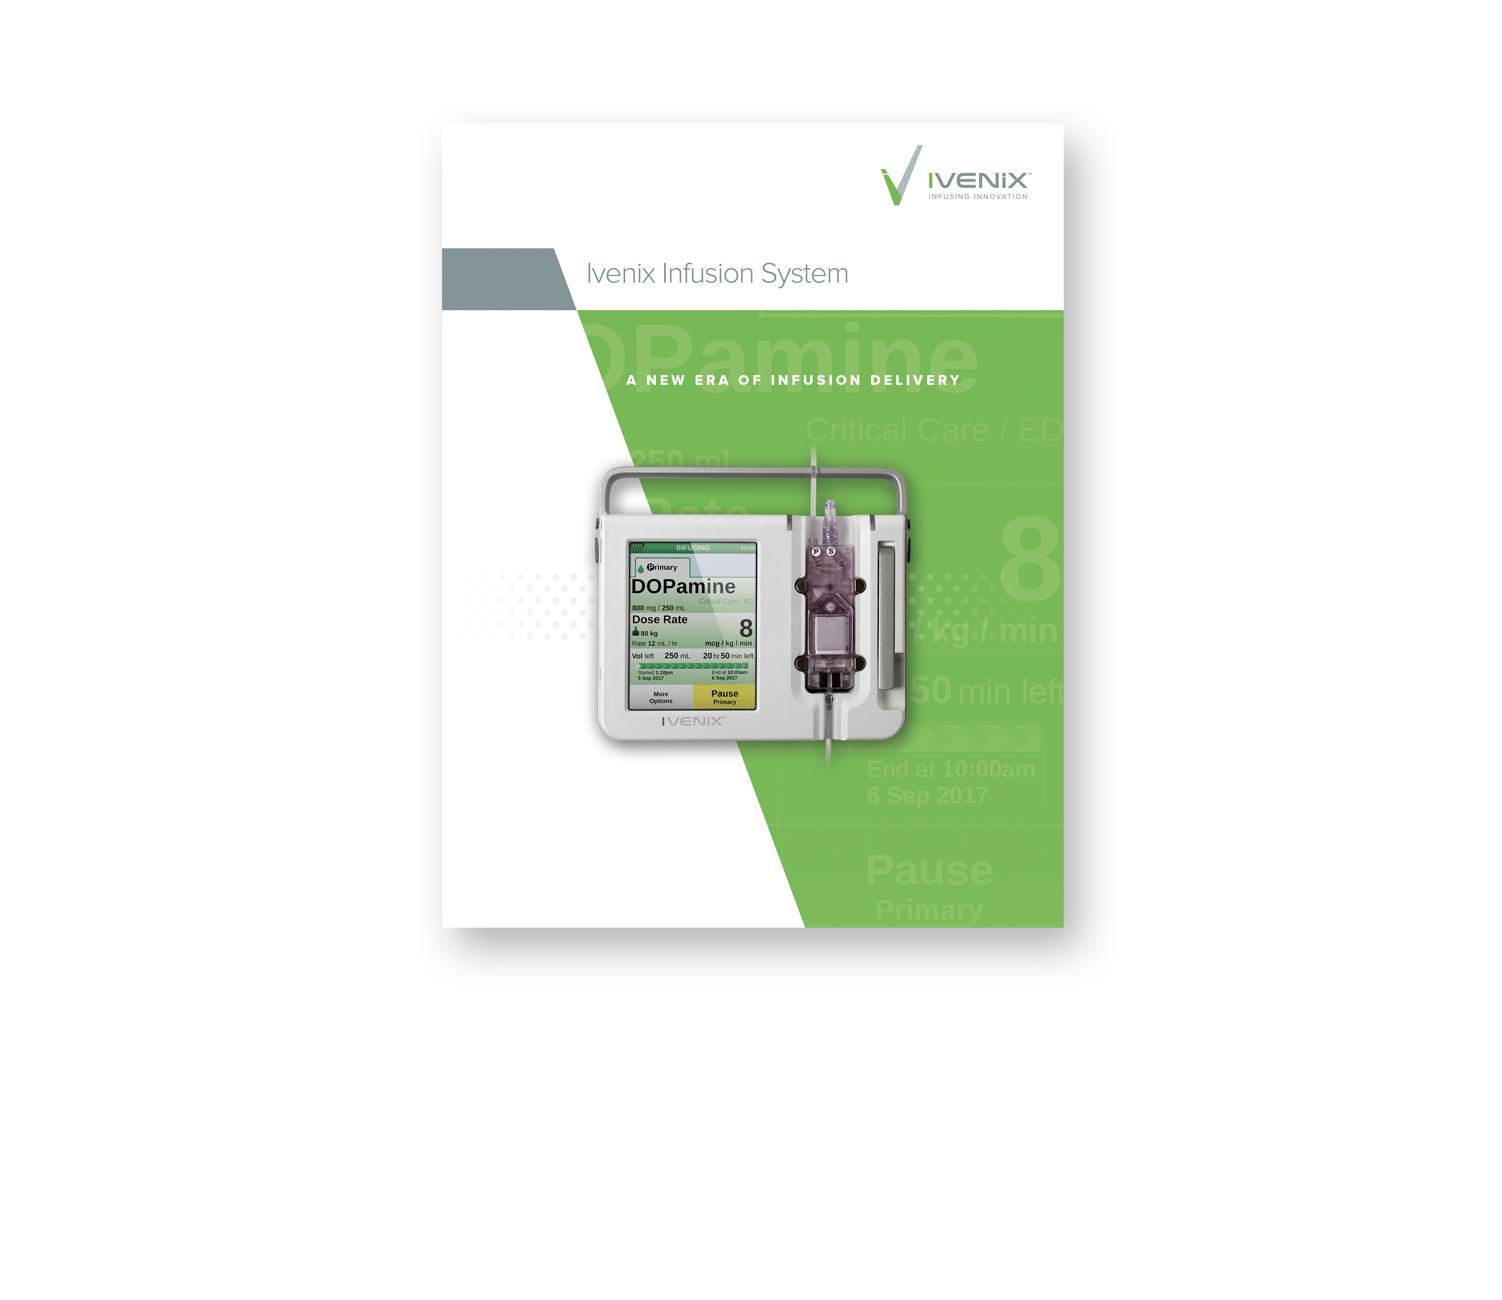 Ivenix_Brochure_Frame1